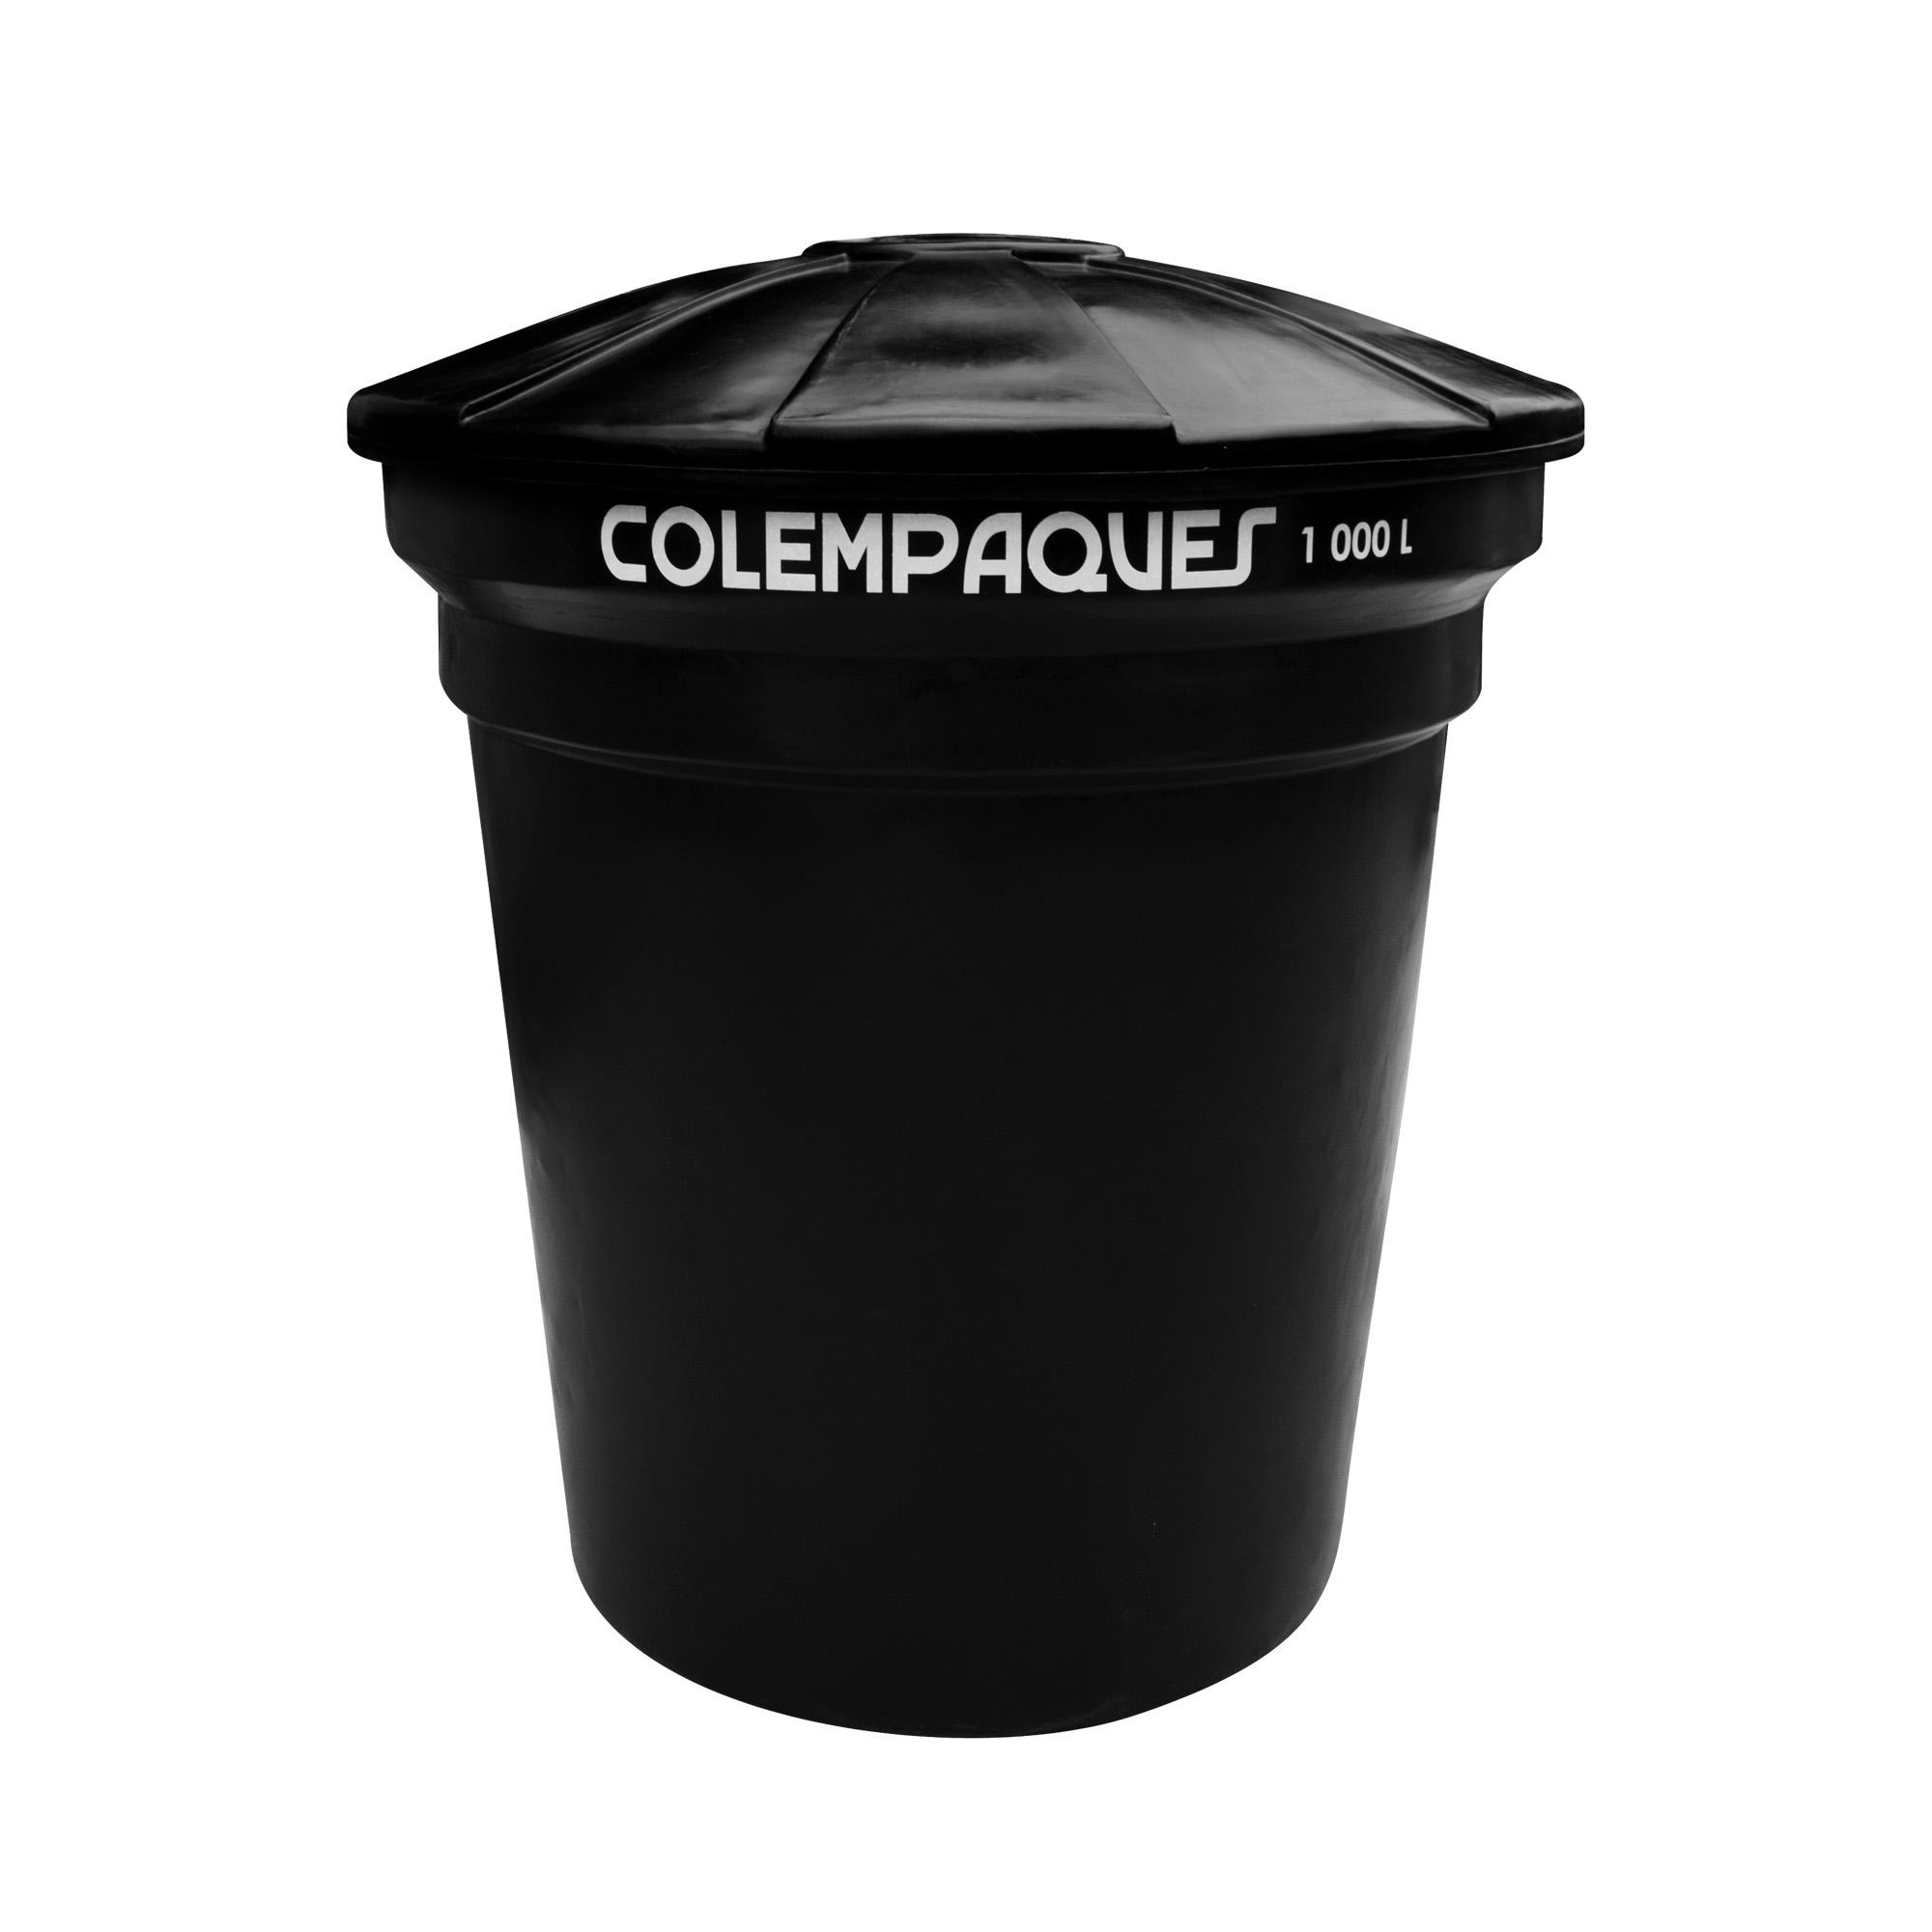 3097-Tanque-Agua-Colempaques-Cónico-1000-L-Tapa-Acce.-Negro-(1).jpg